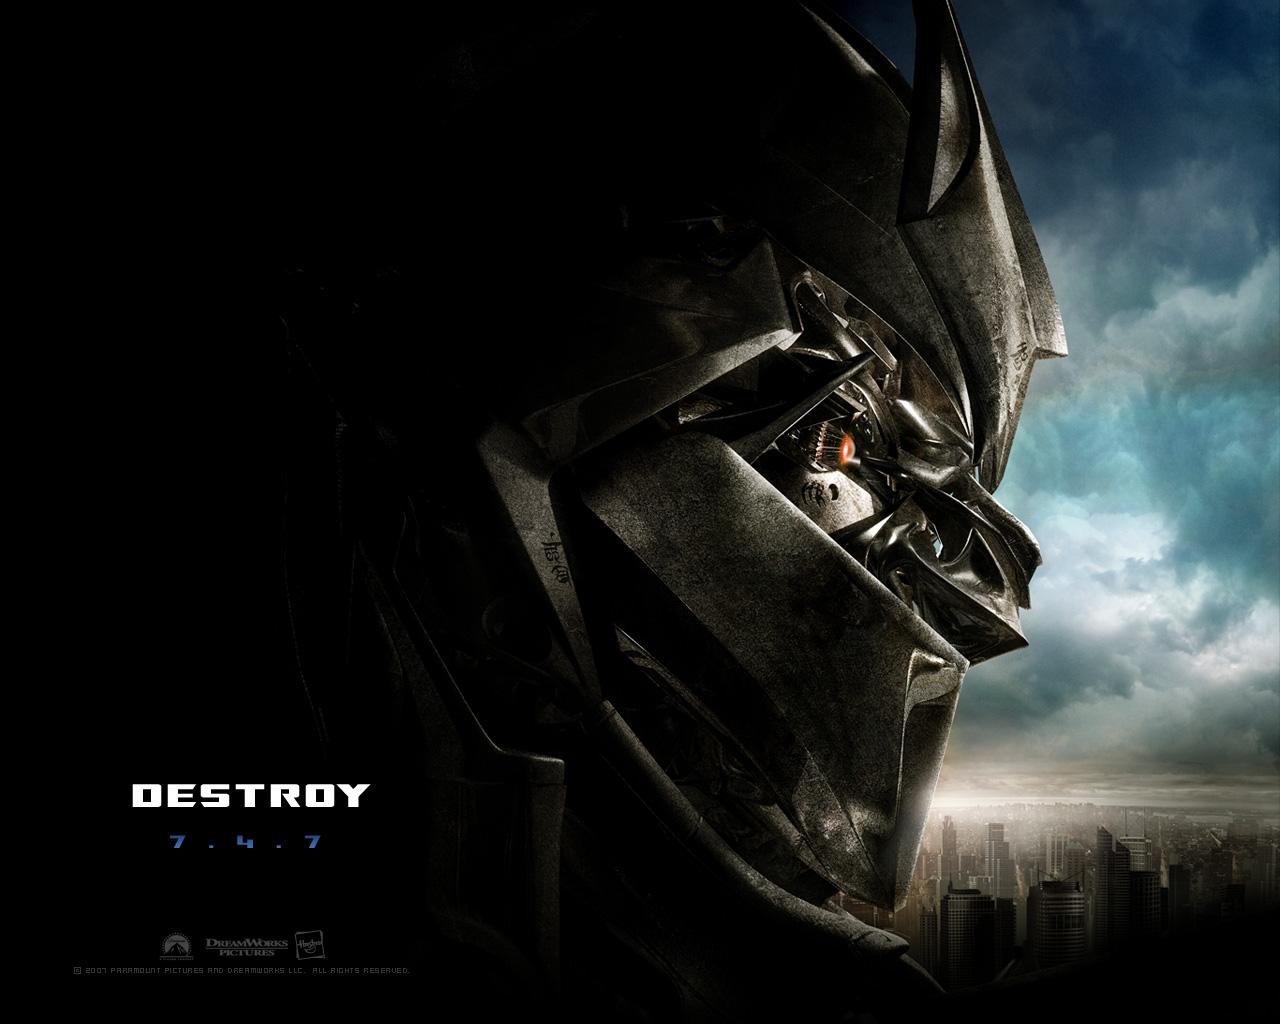 Transformers Movie  Megatron transformers 35015 1280 1024jpg 1280x1024